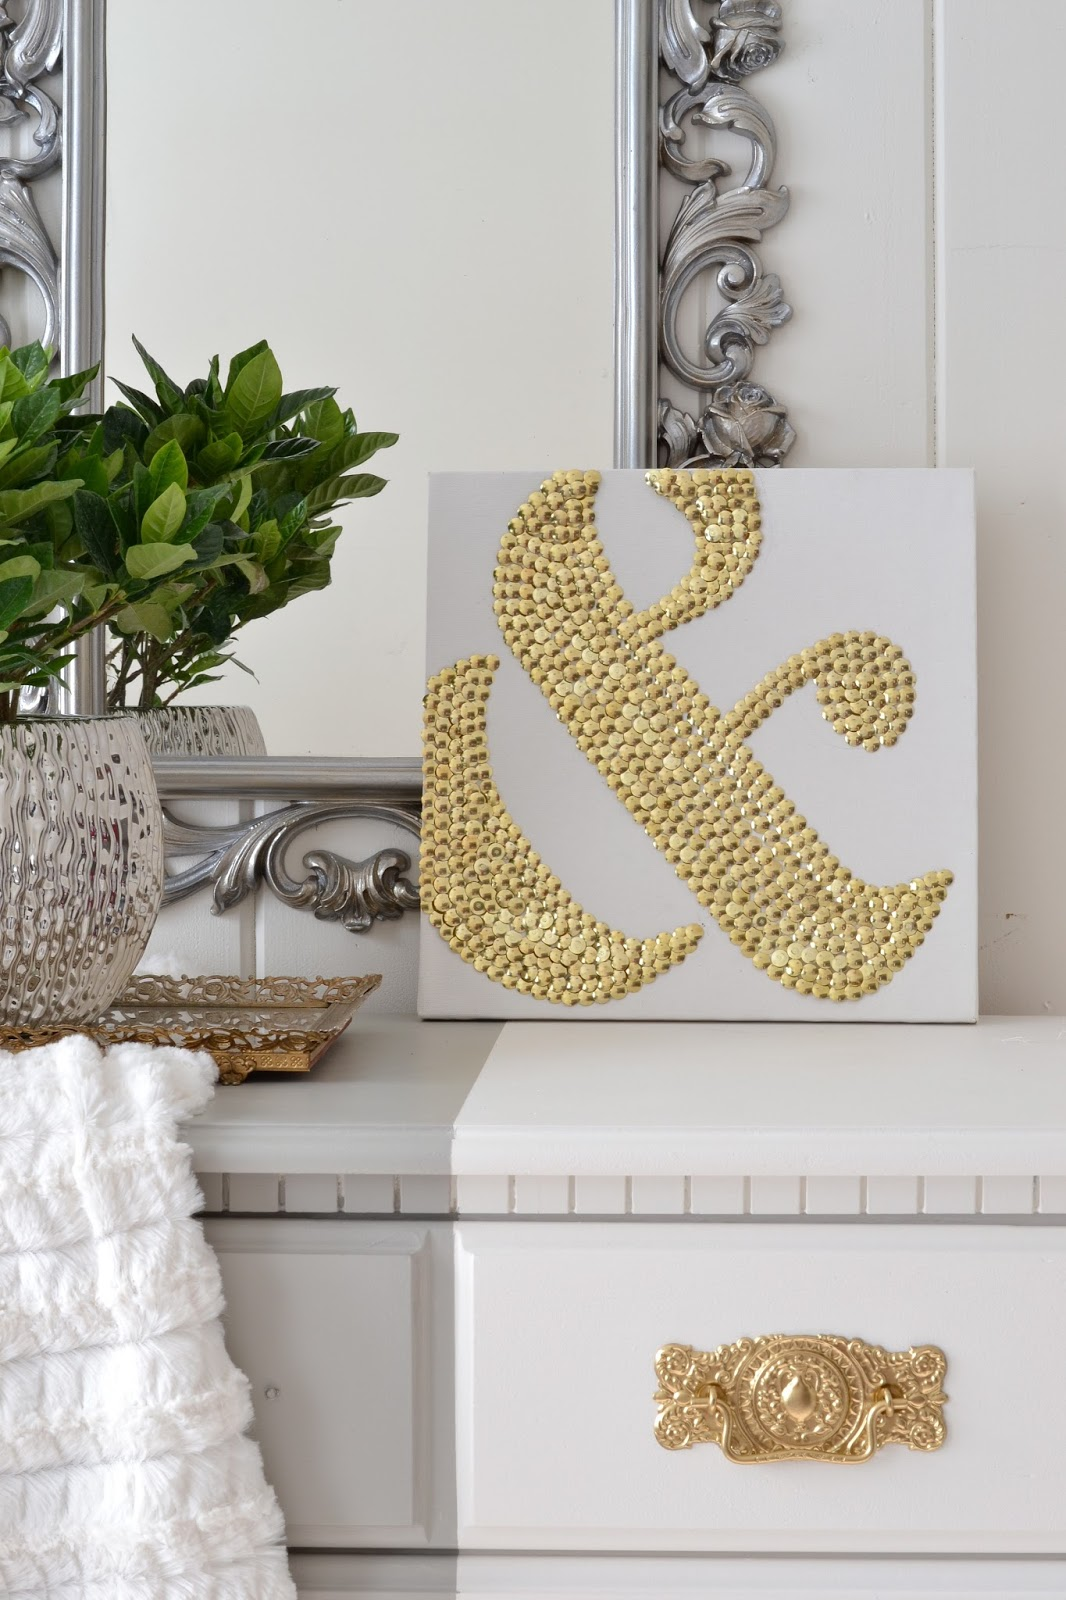 LiveLoveDIY: 10 DIY Art Ideas: Easy Ways to Decorate Your ...